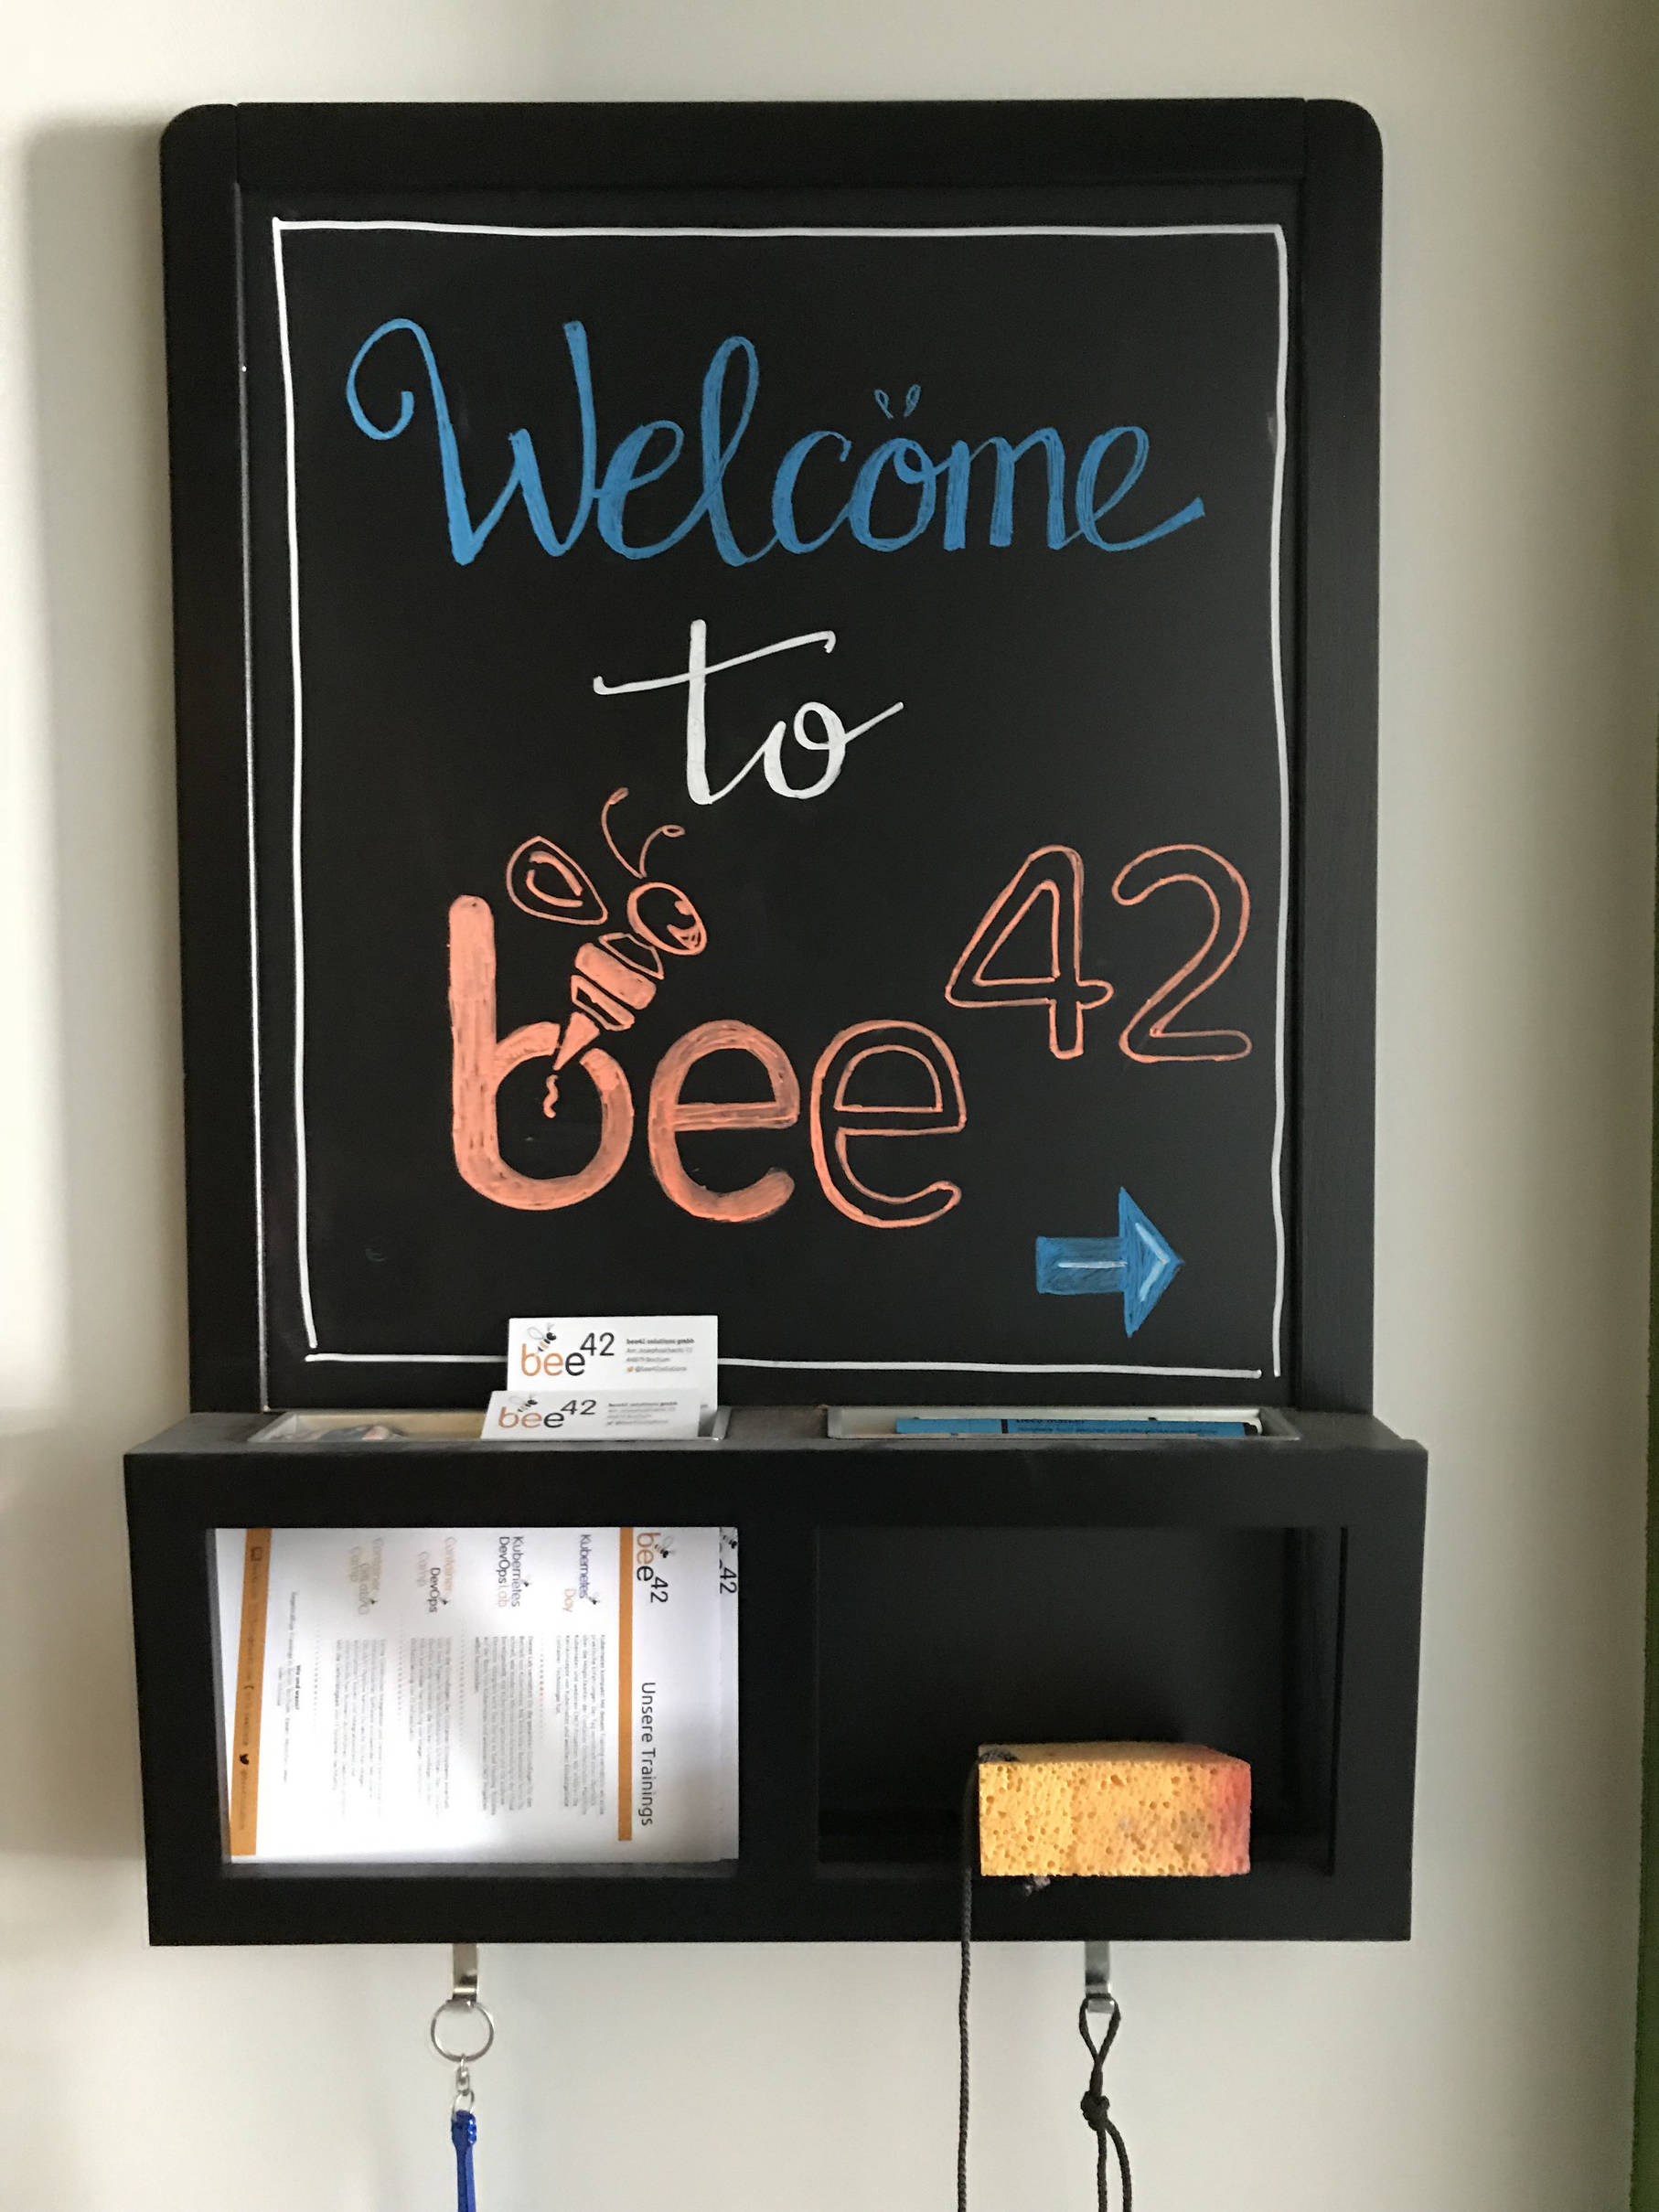 bee42 welcome